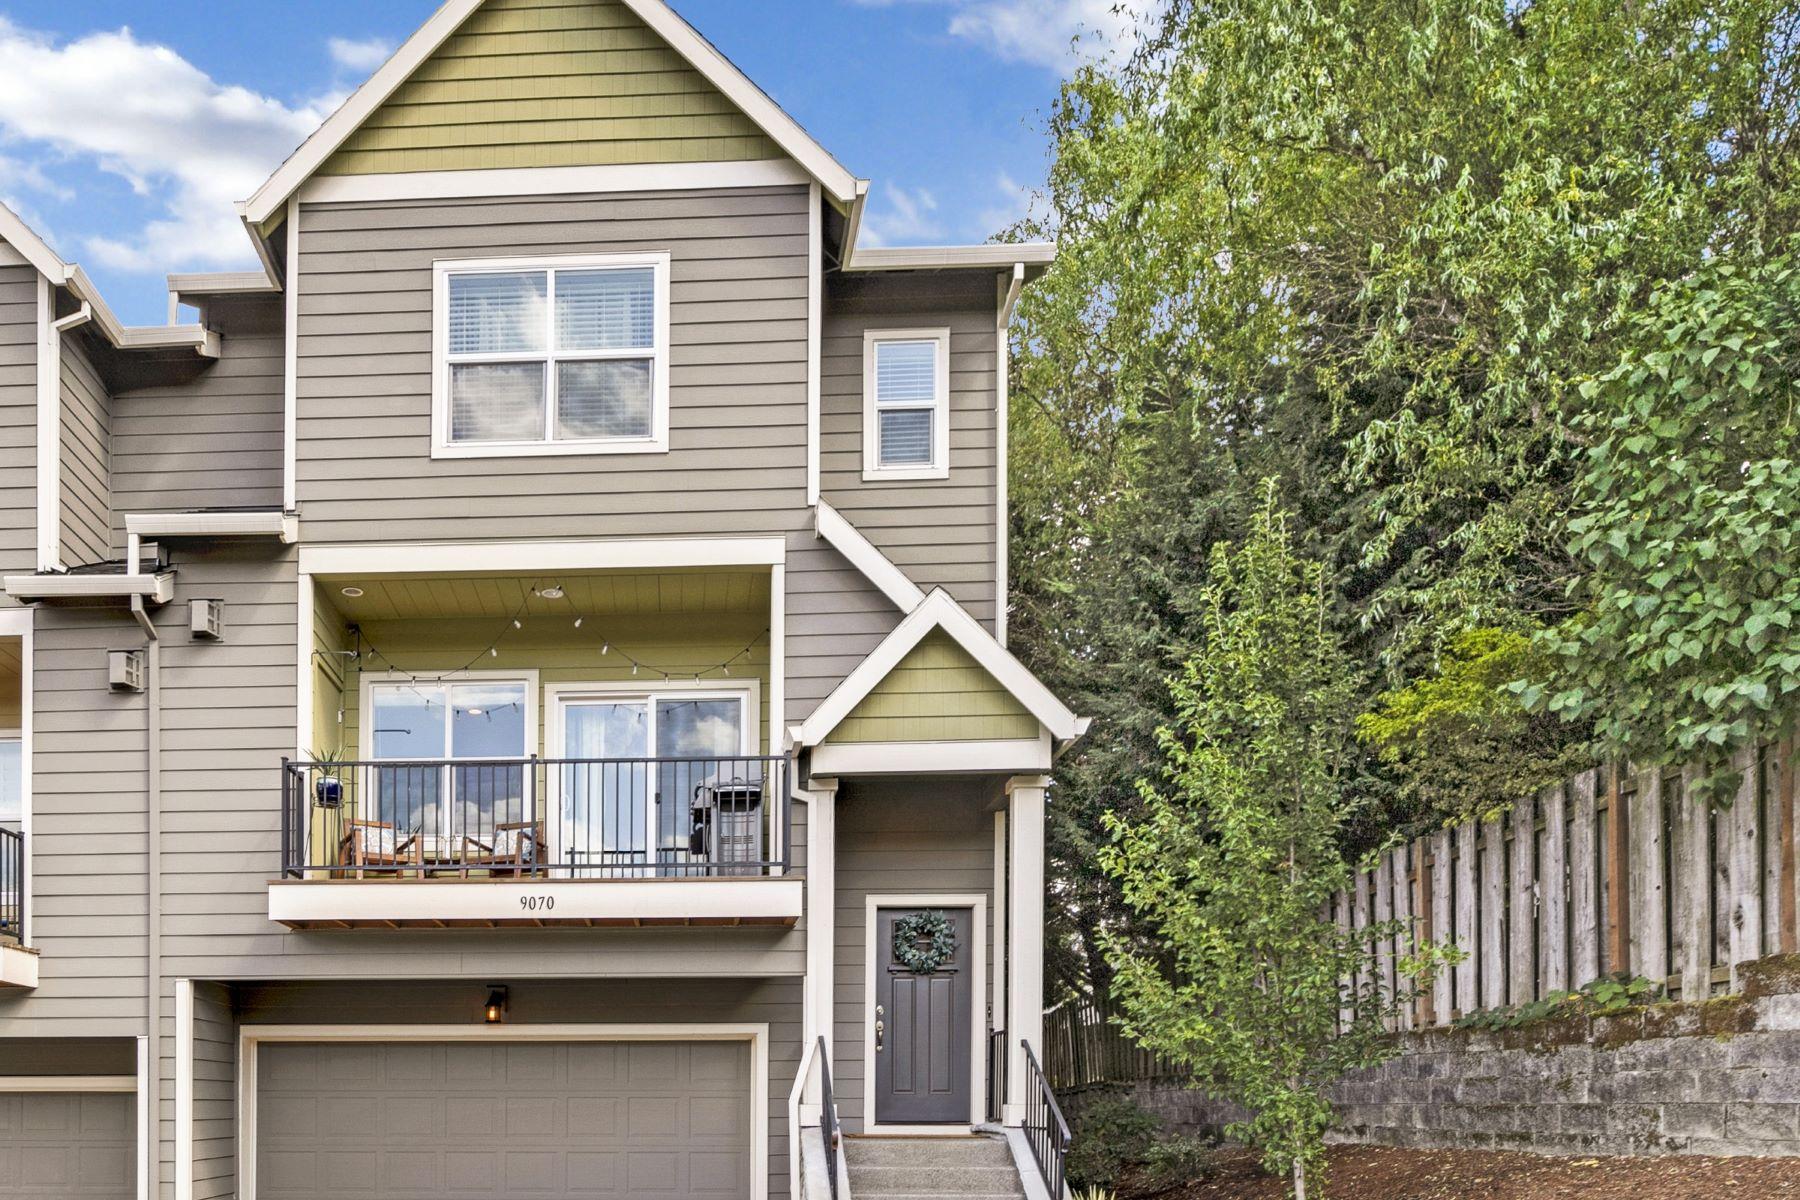 Single Family Homes 為 出售 在 Great Value in Beaverton 9070 SW 157th Ave, Beaverton, 俄勒岡州 97007 美國